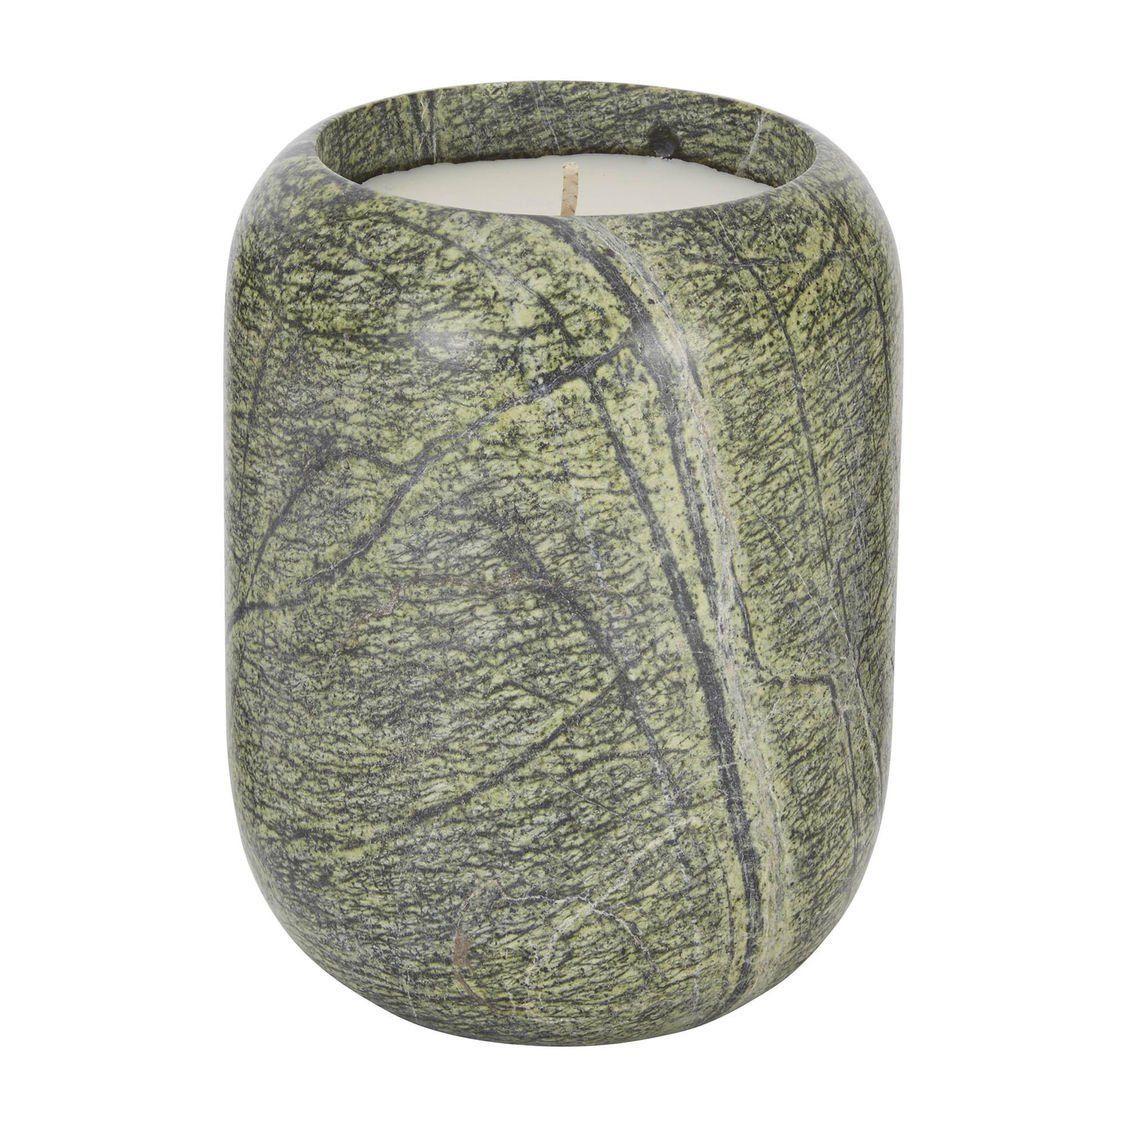 Materialism Stone Candle   Tom Dixon   AmbienteDirect.com